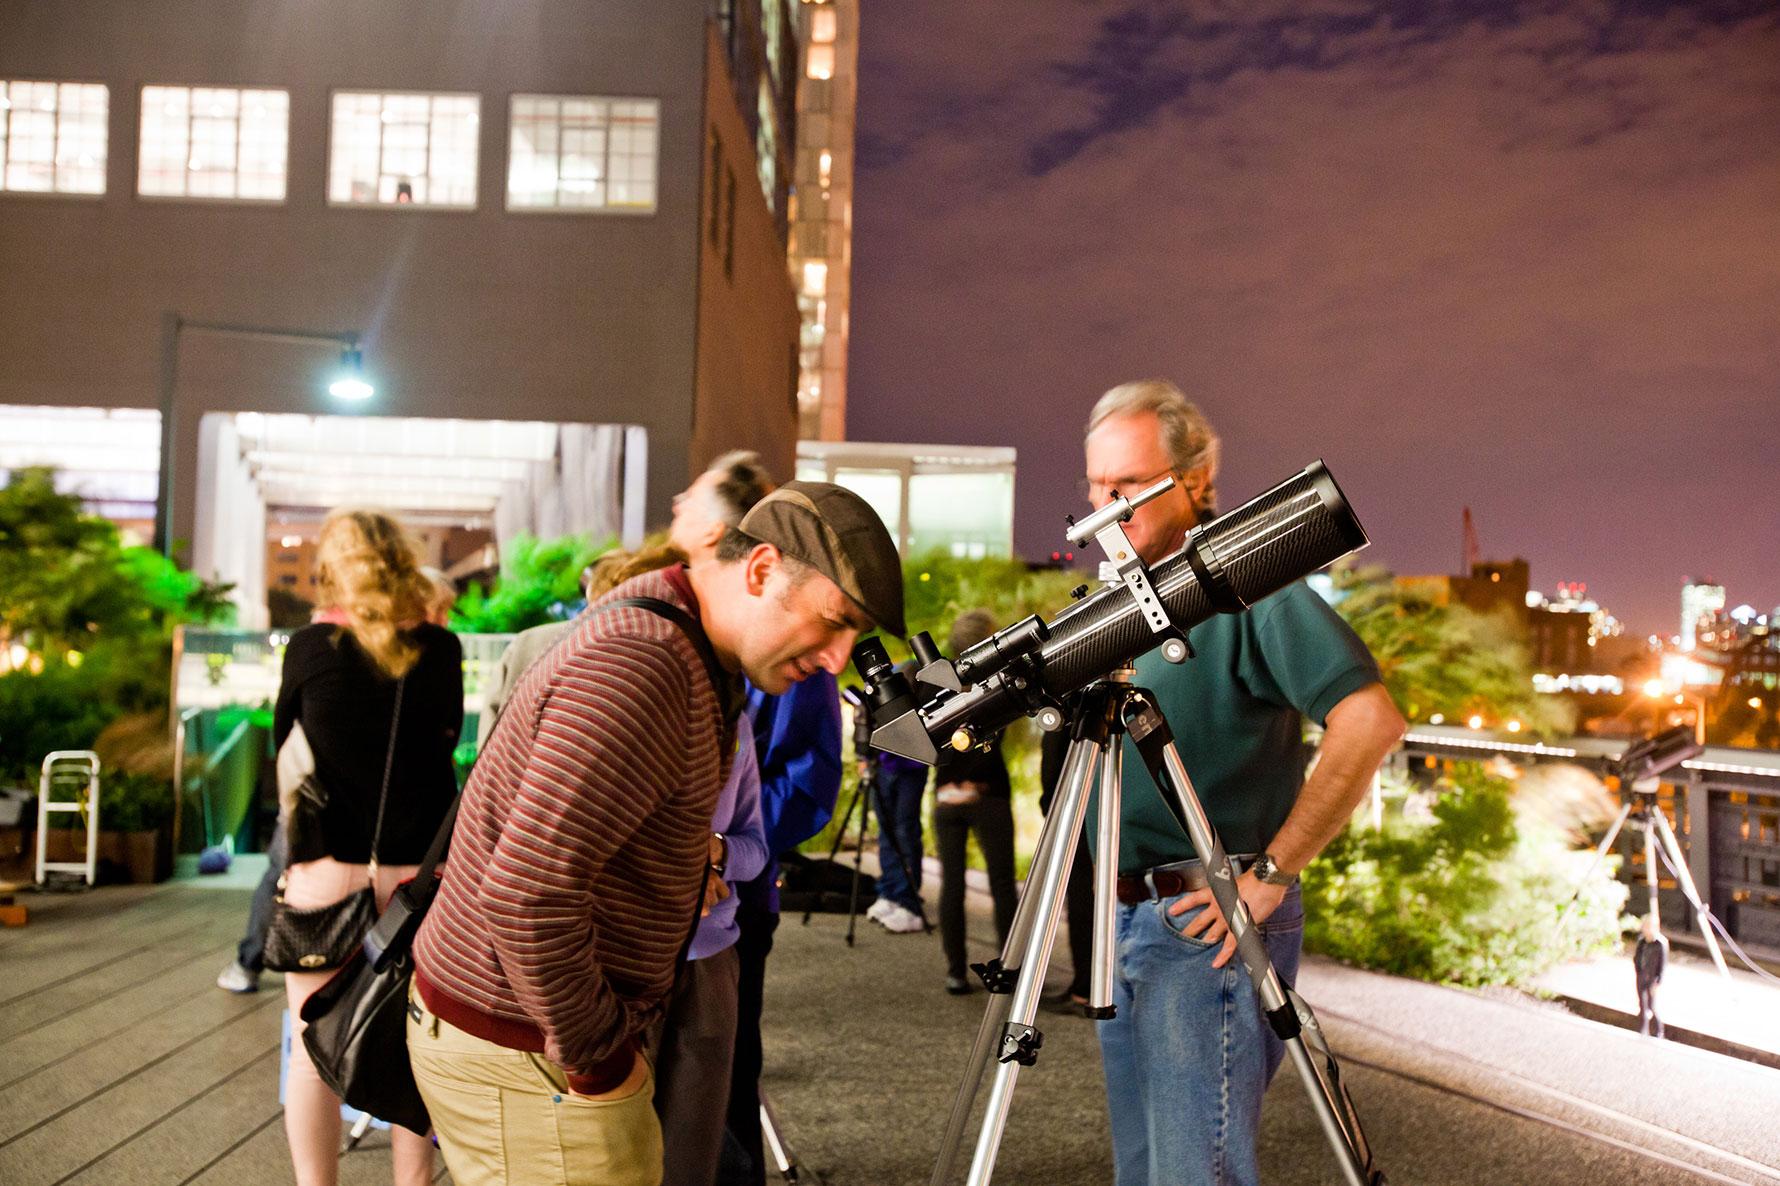 A person looking through a telescope